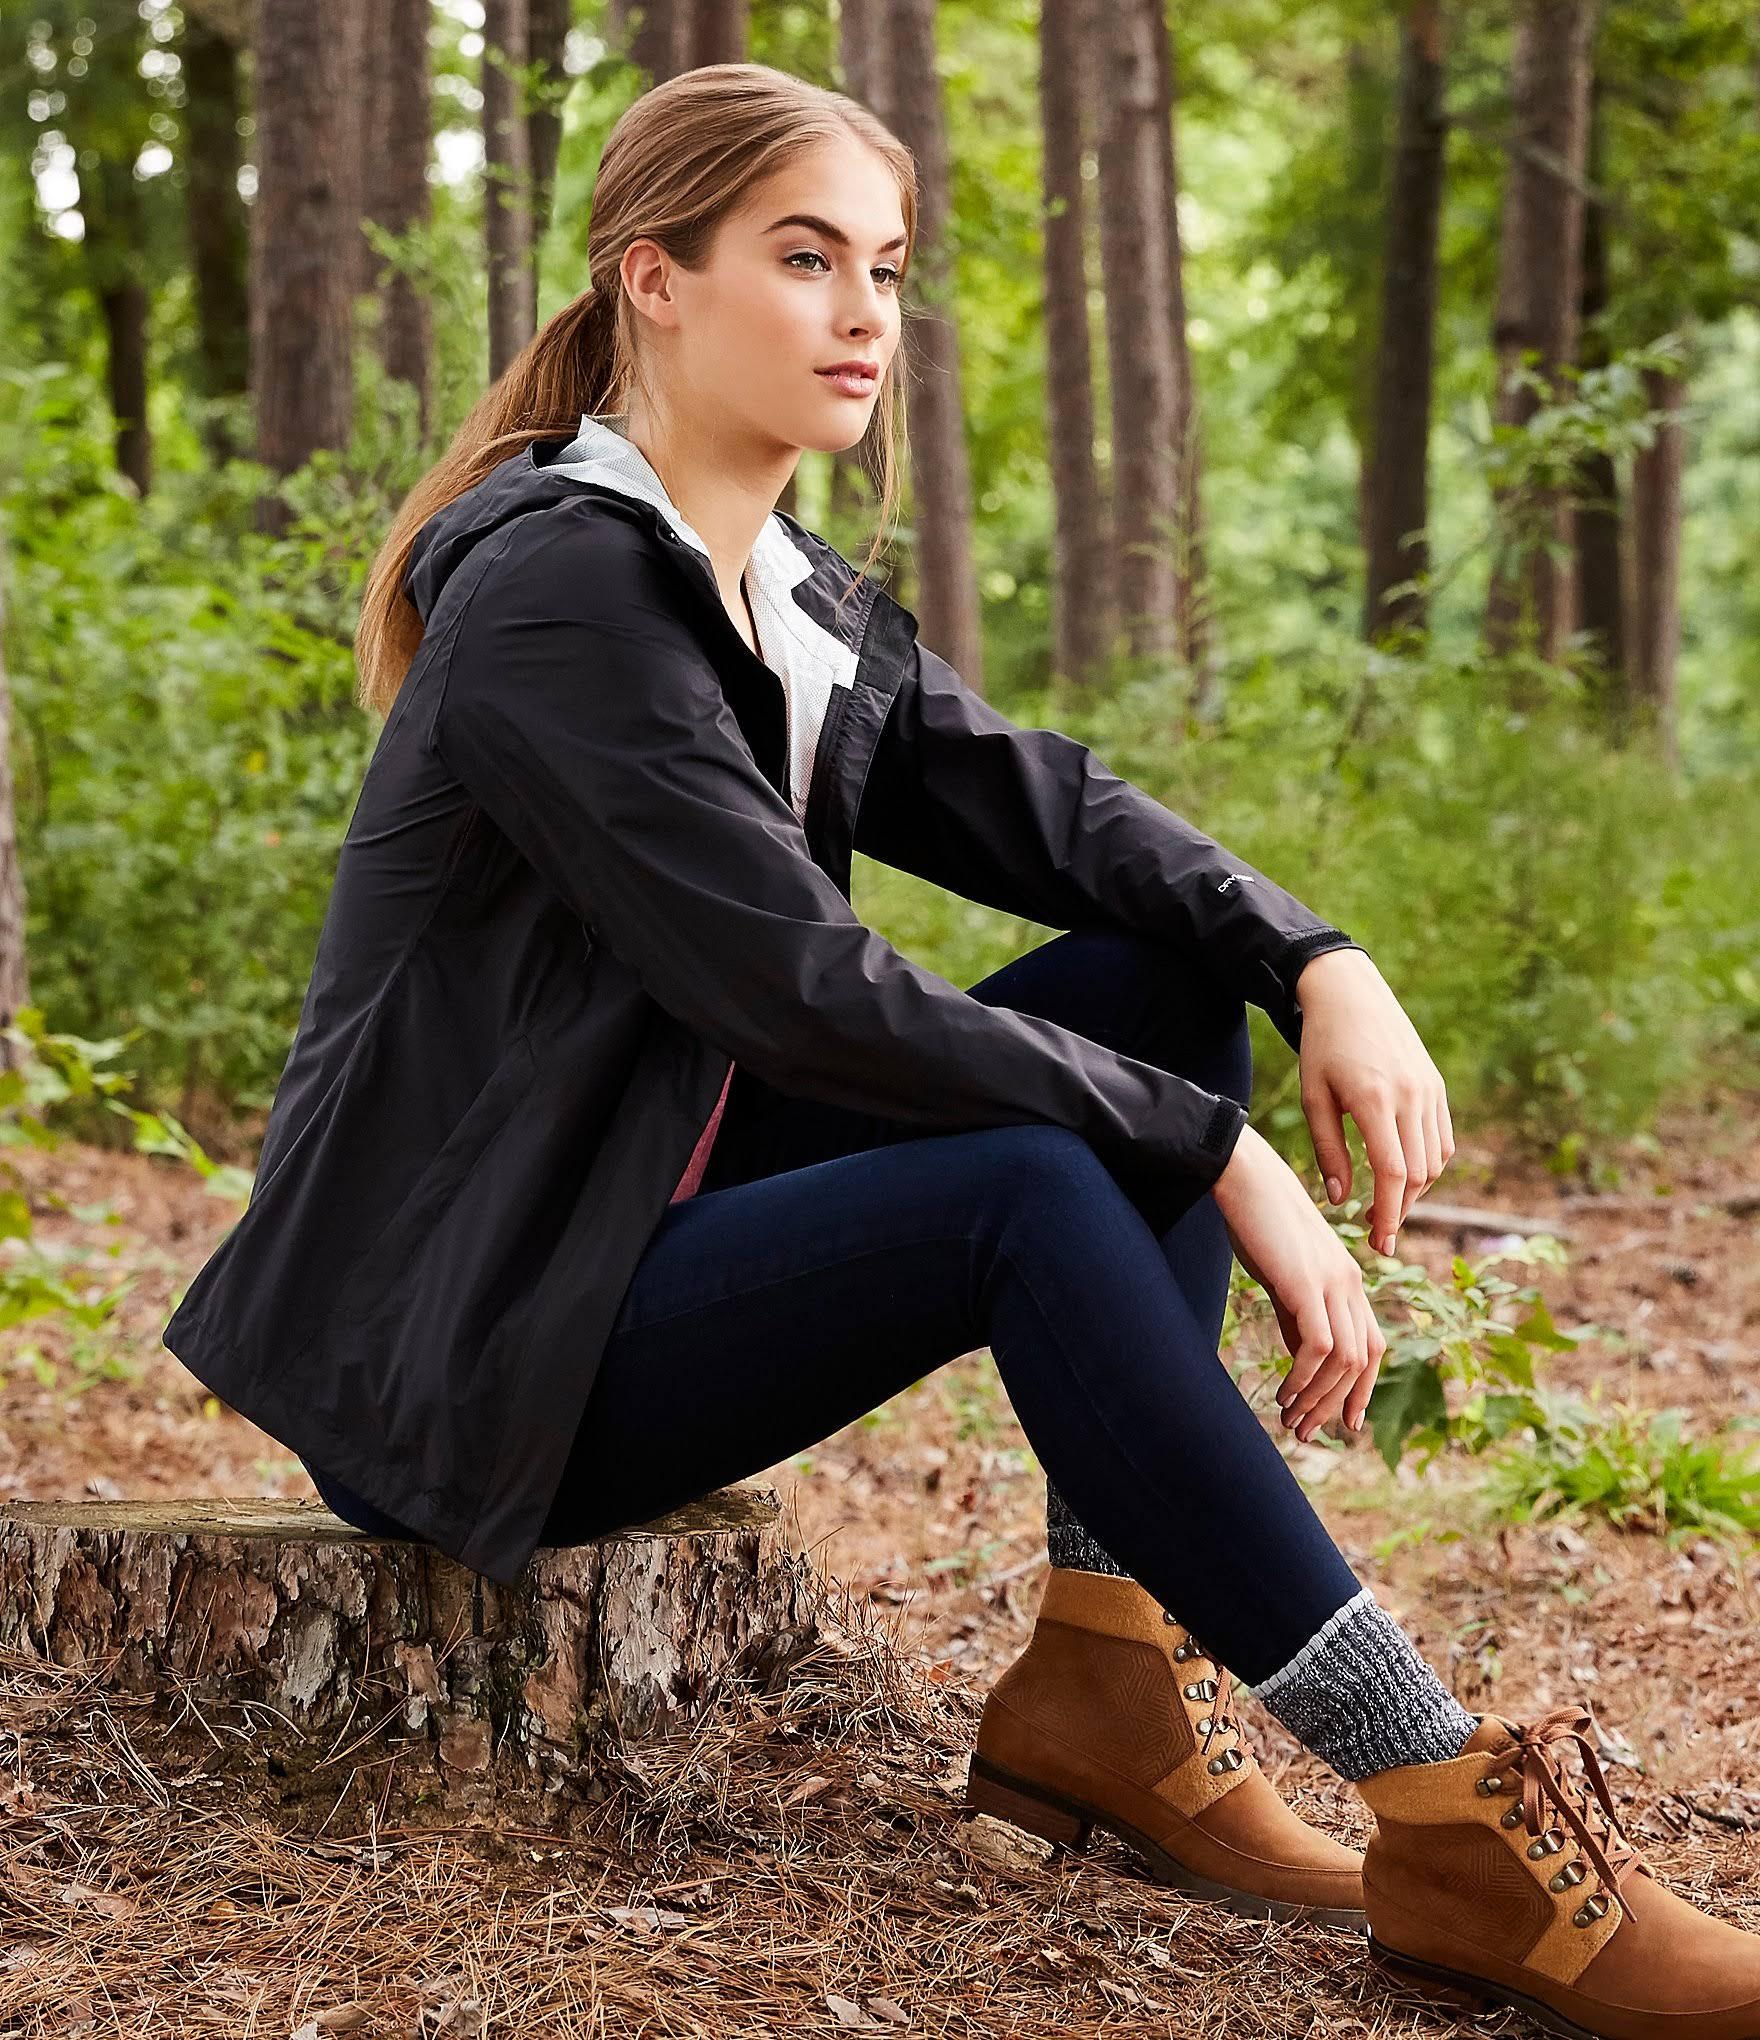 The Tnfblack Venture Damen Face Jacket North Für 2 Nf0a2vcr 1x1O8